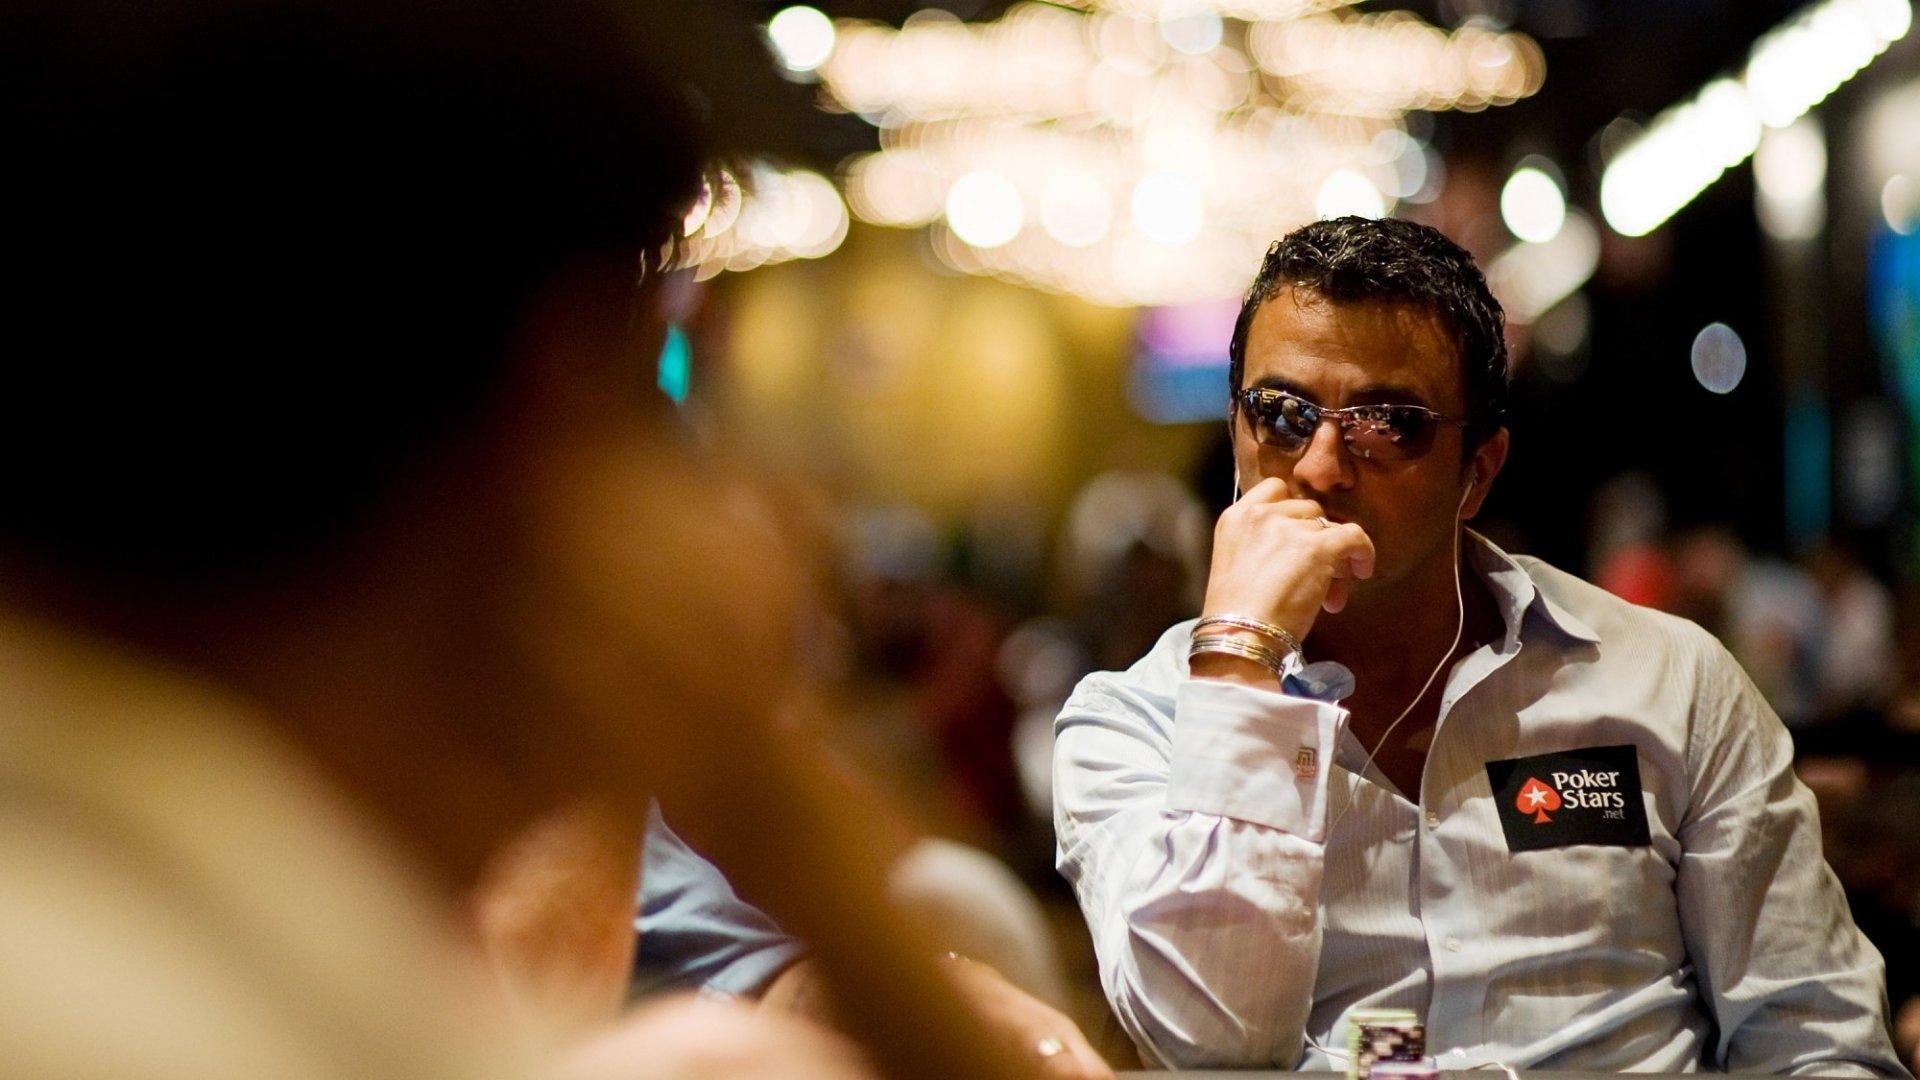 Artificial Intelligence Poker Champ Bluffs Its Way to $1.7 Million